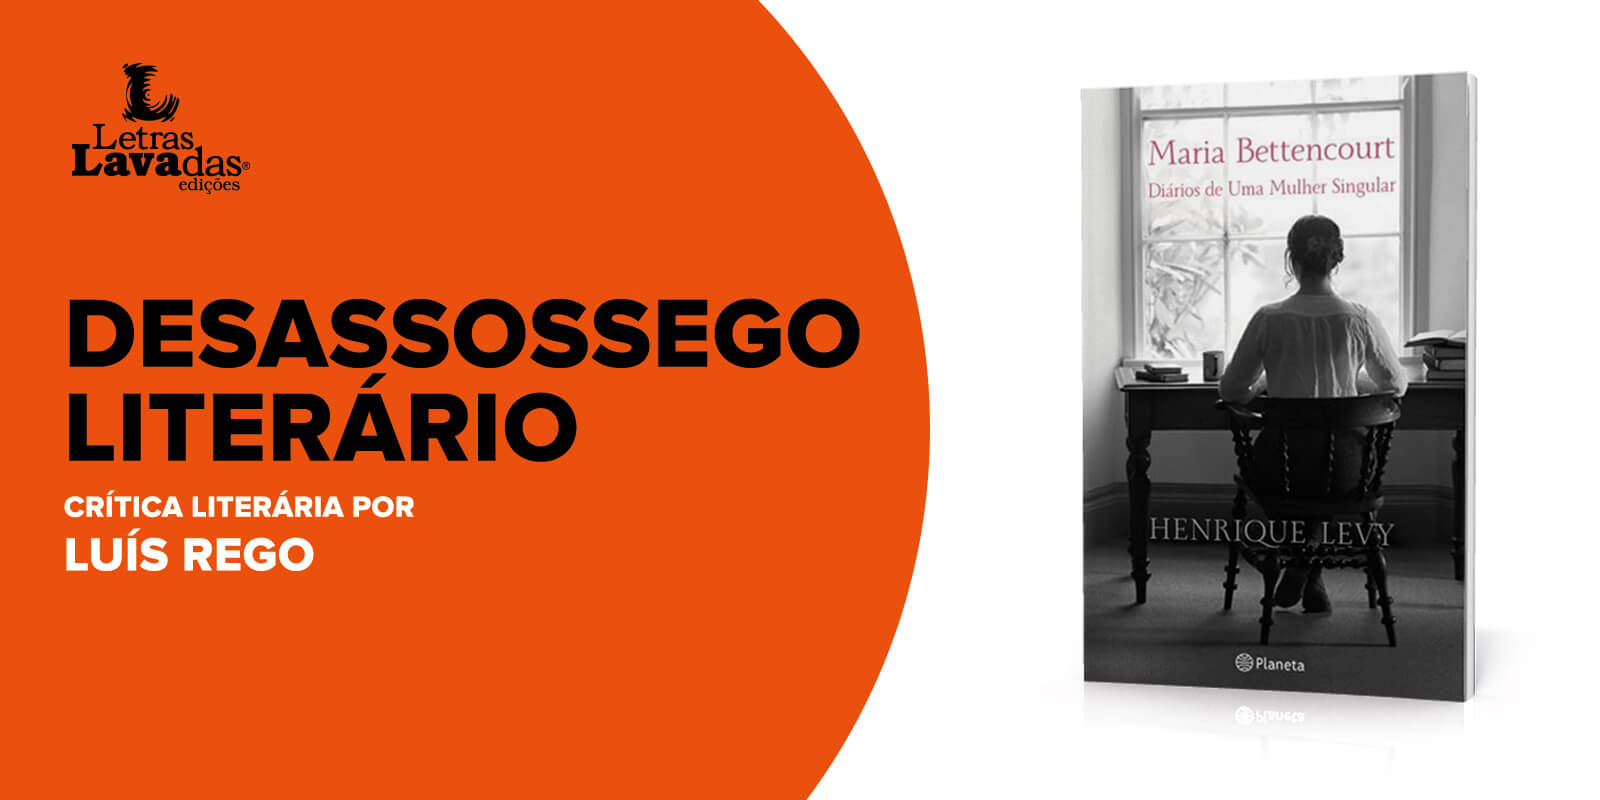 Desassossego-Literário (Maria Bettencourt)